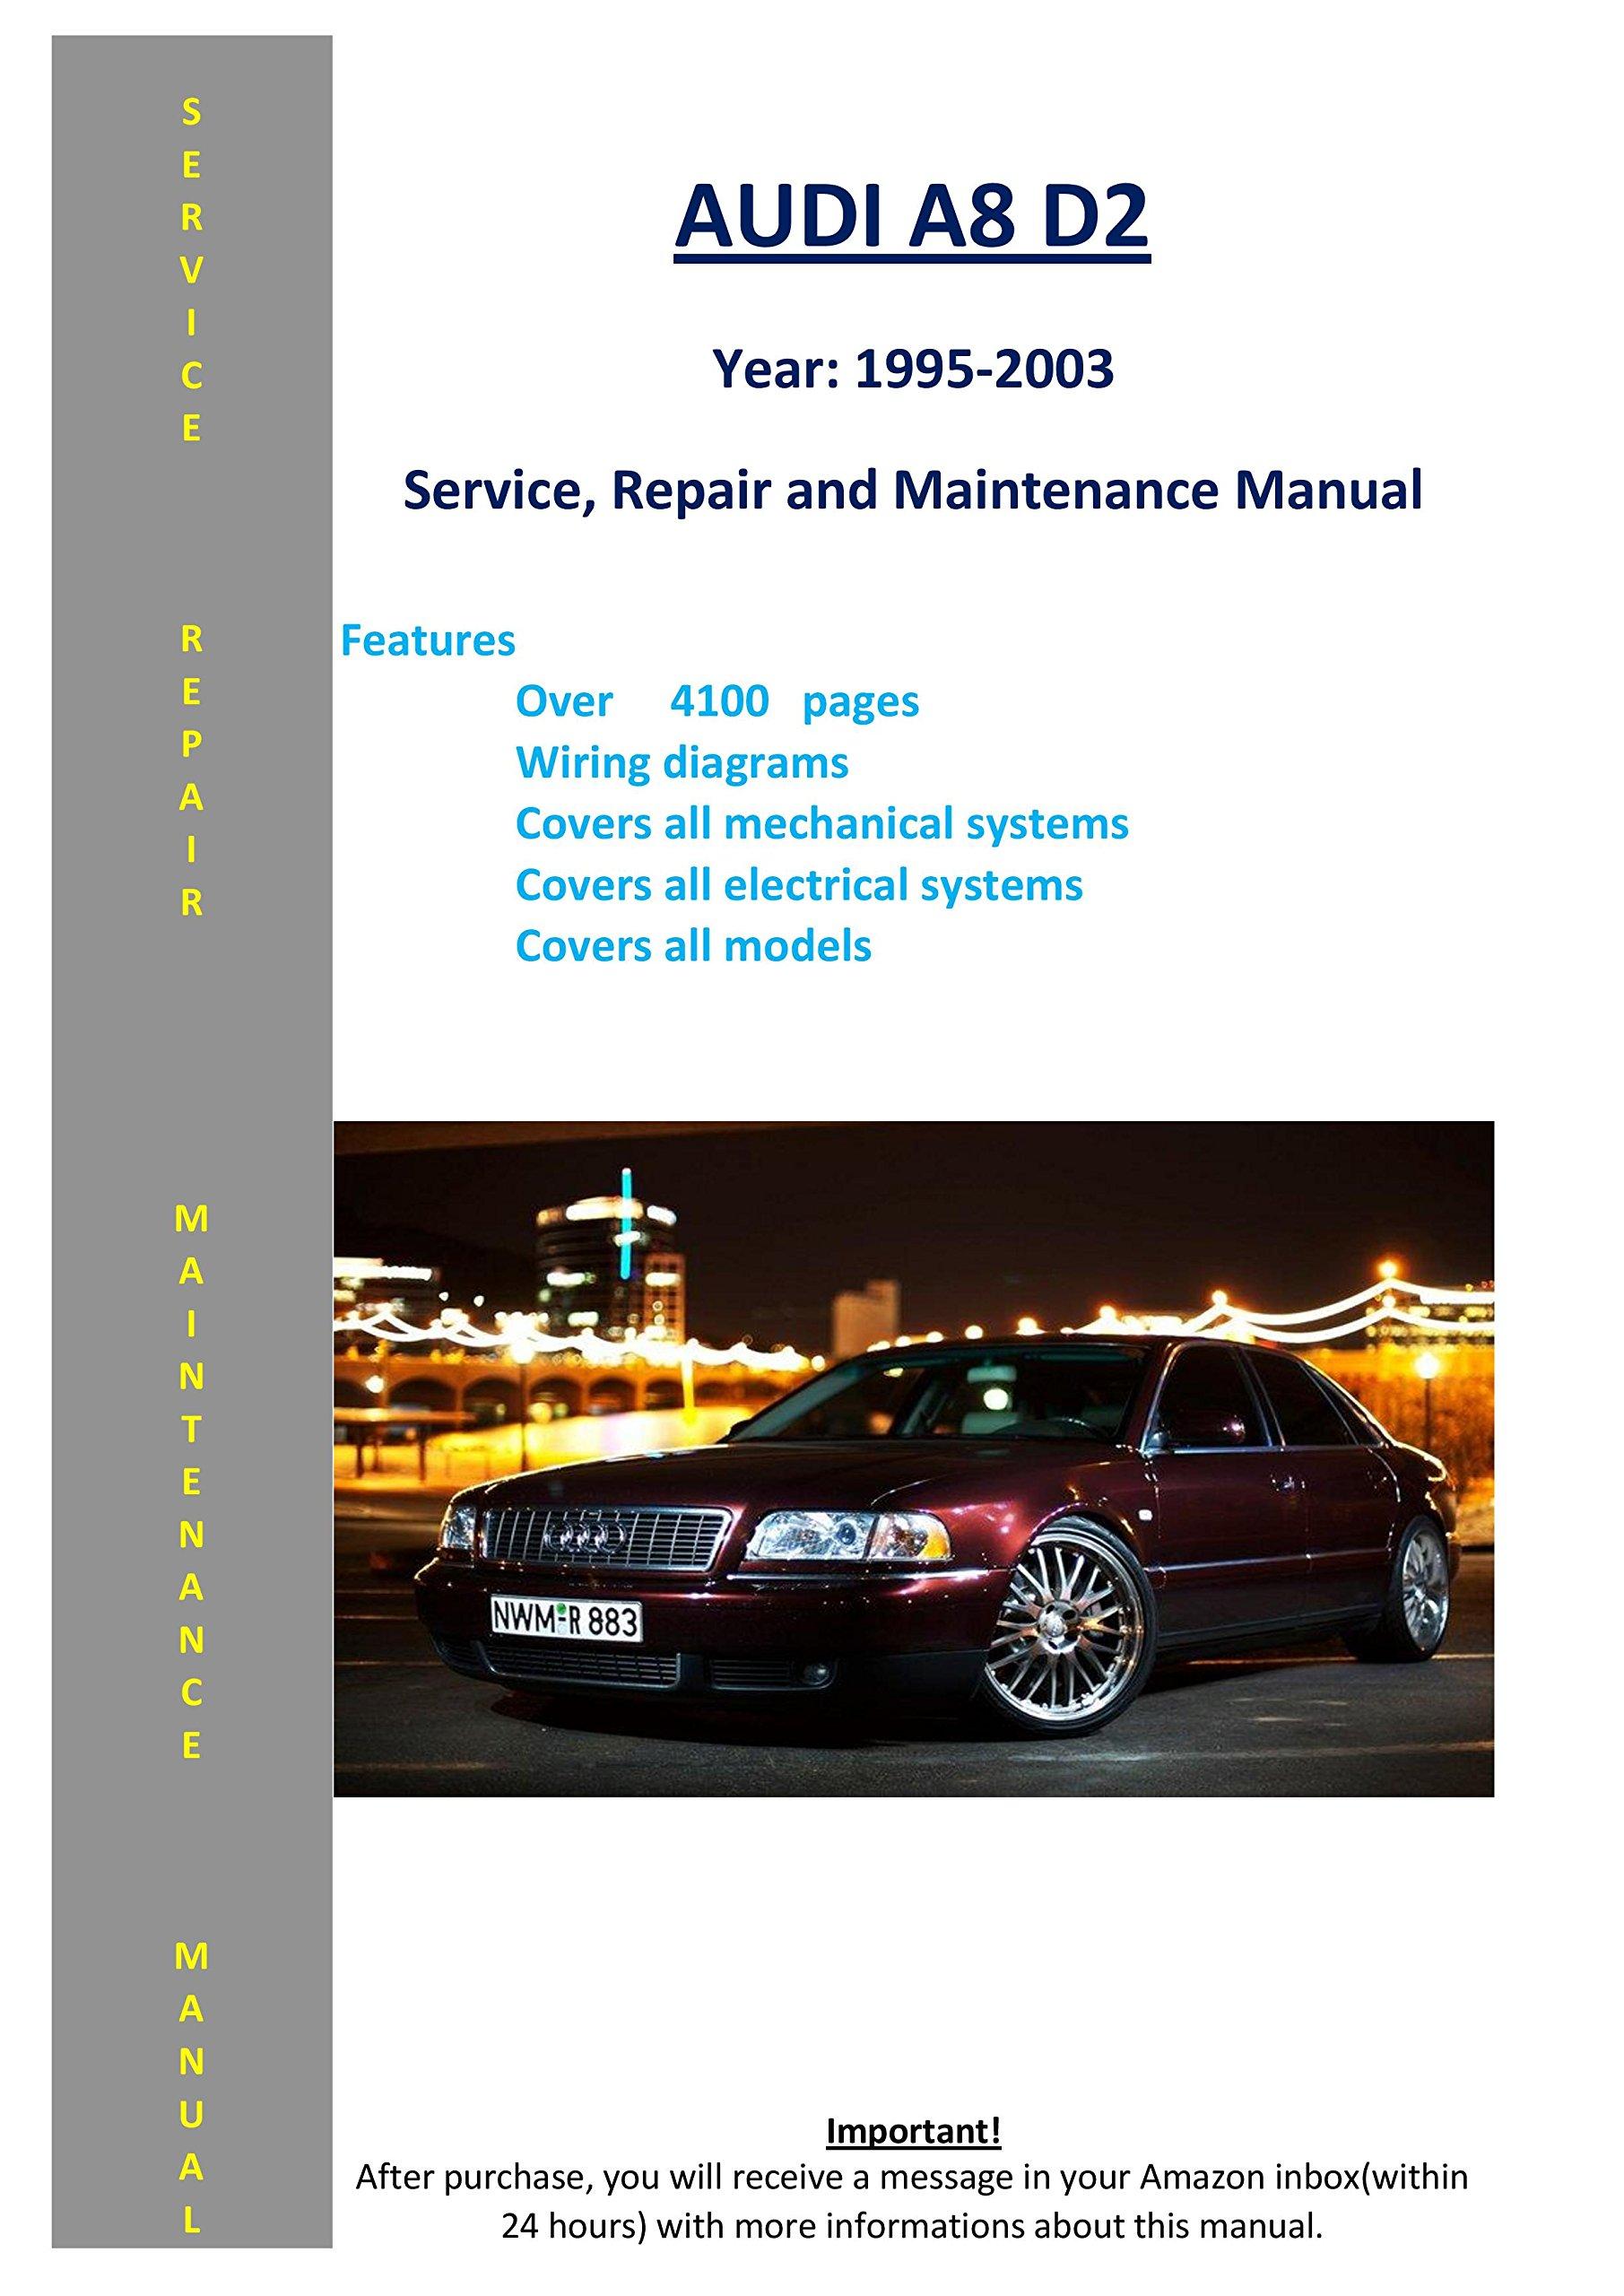 audi a8 d2 from 1995-2003 service repair maintenance manual map – 2005